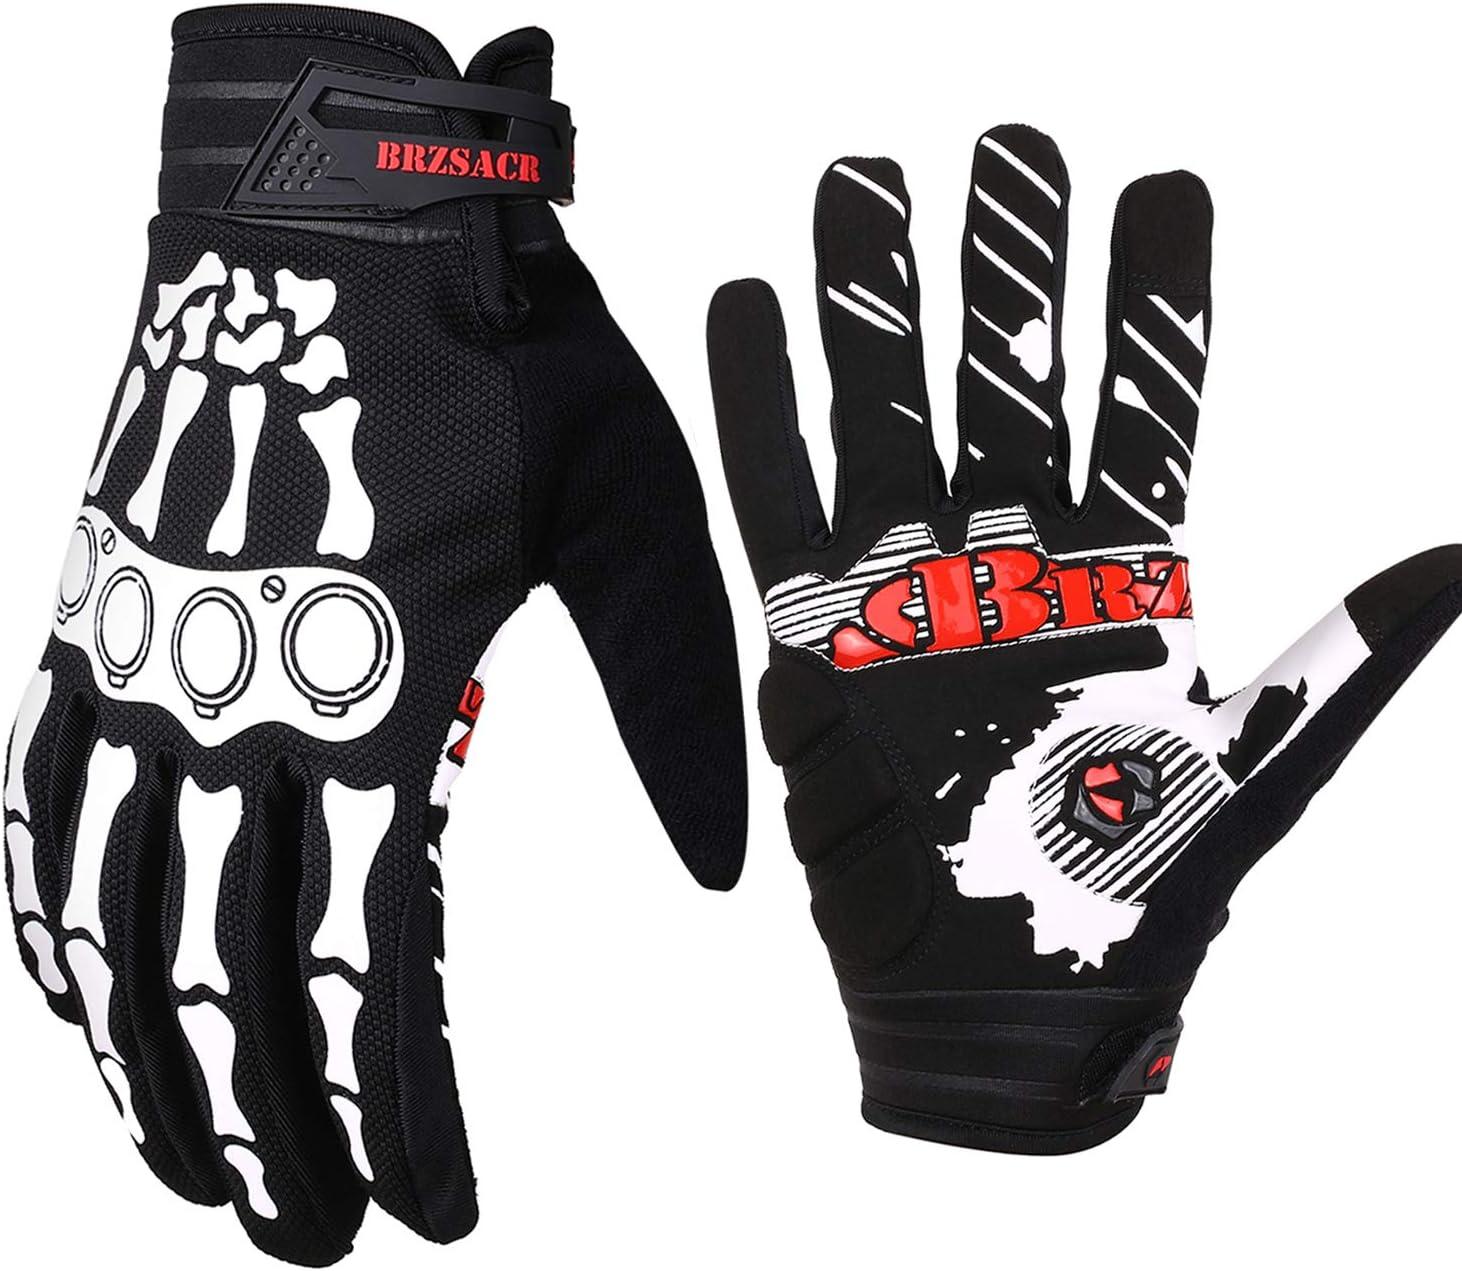 Outdoor Cycling Bicycle Motorcycle Sport Half Finger Glove MTB Bike Racing Glove